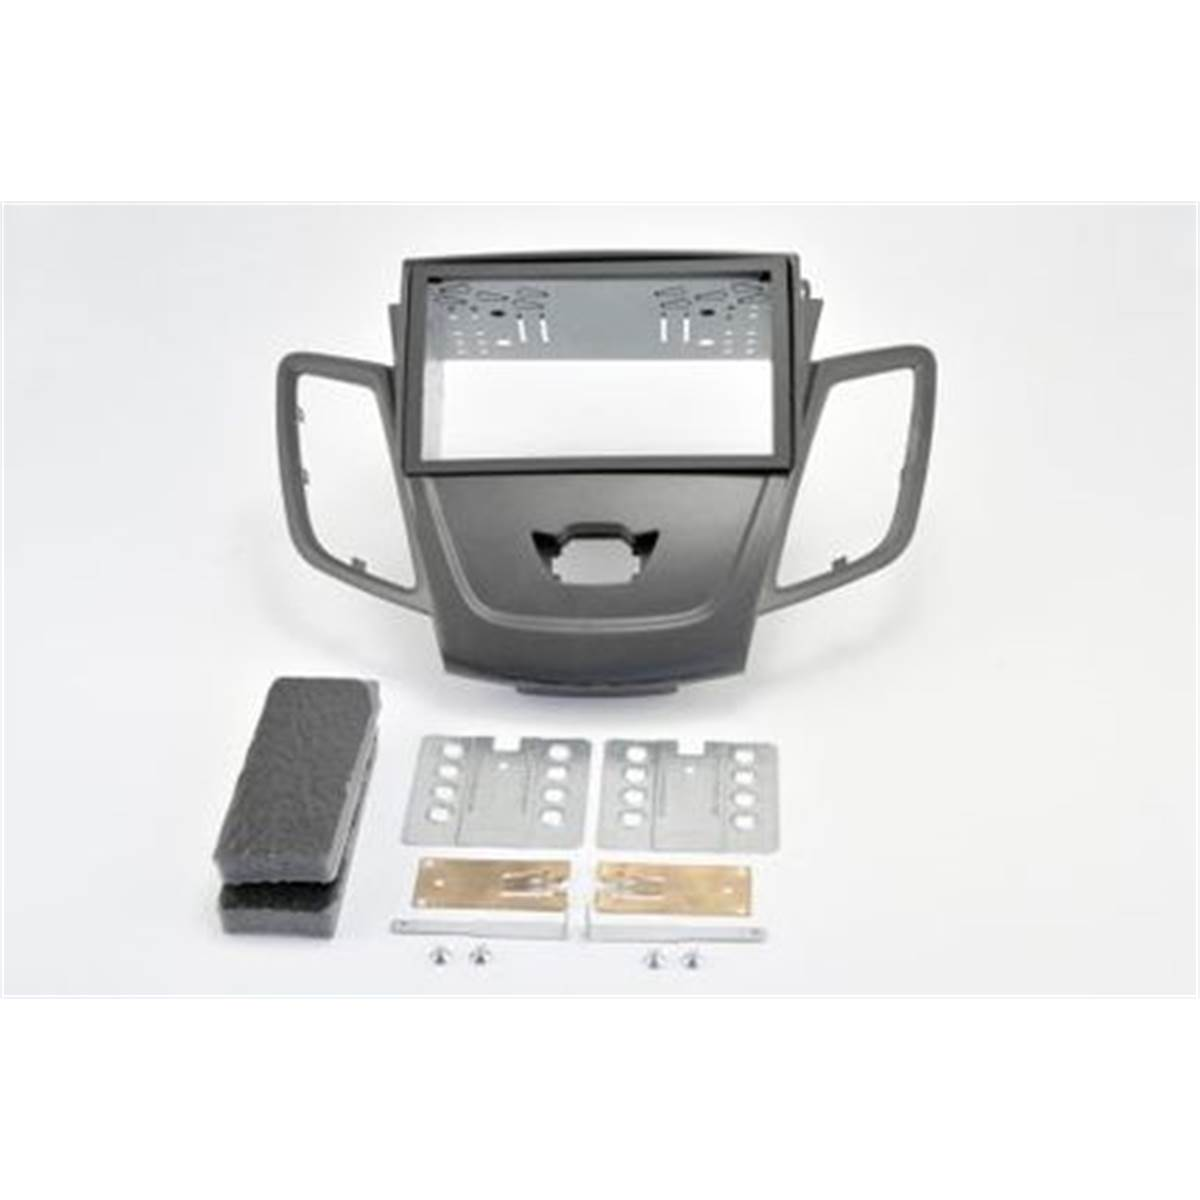 Support autoradio double DIN gris métal FORD FIESTA 2008>